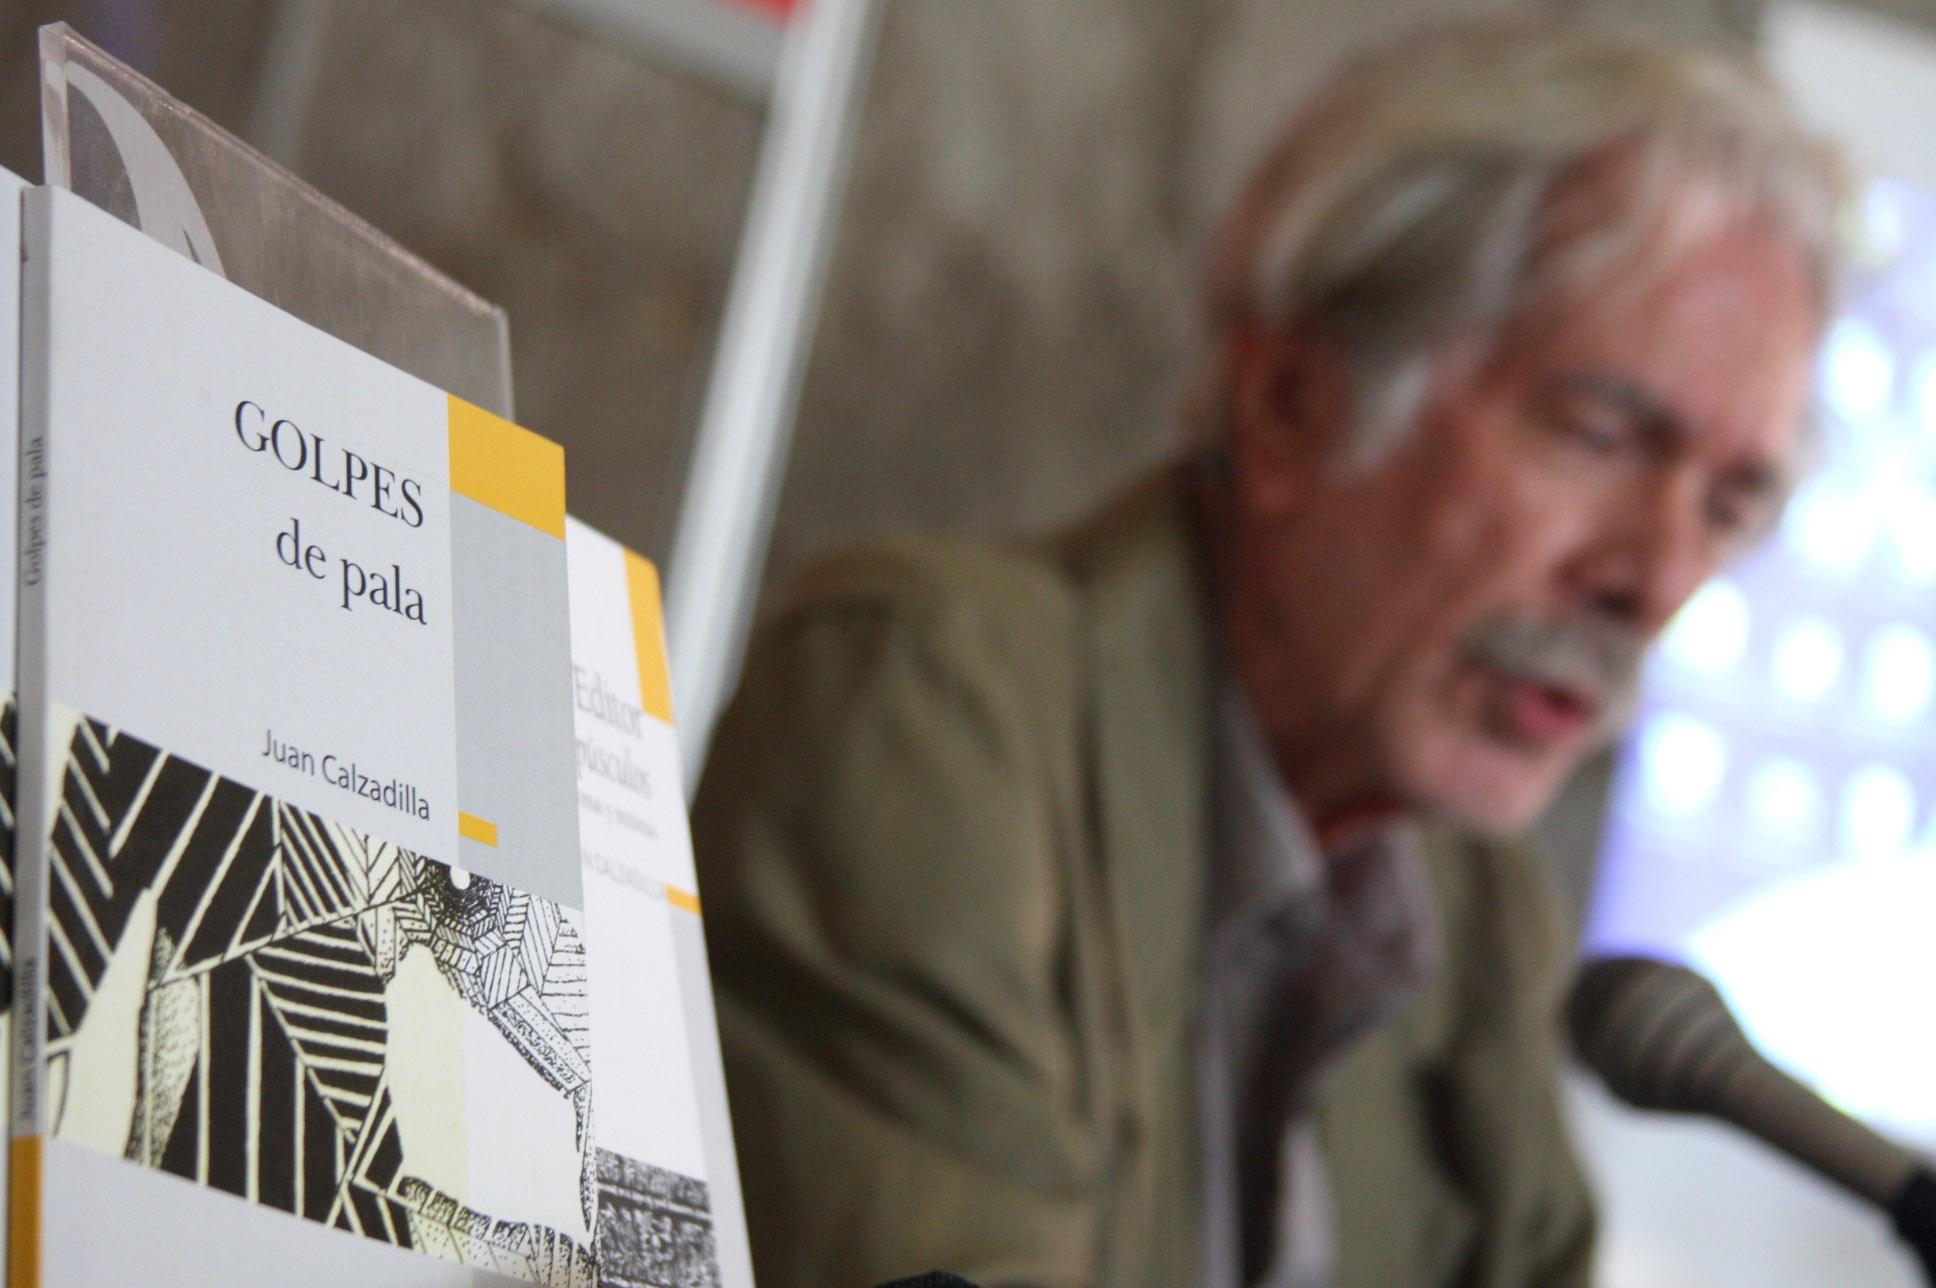 03 presentacion de libros (Juan Calzadilla)